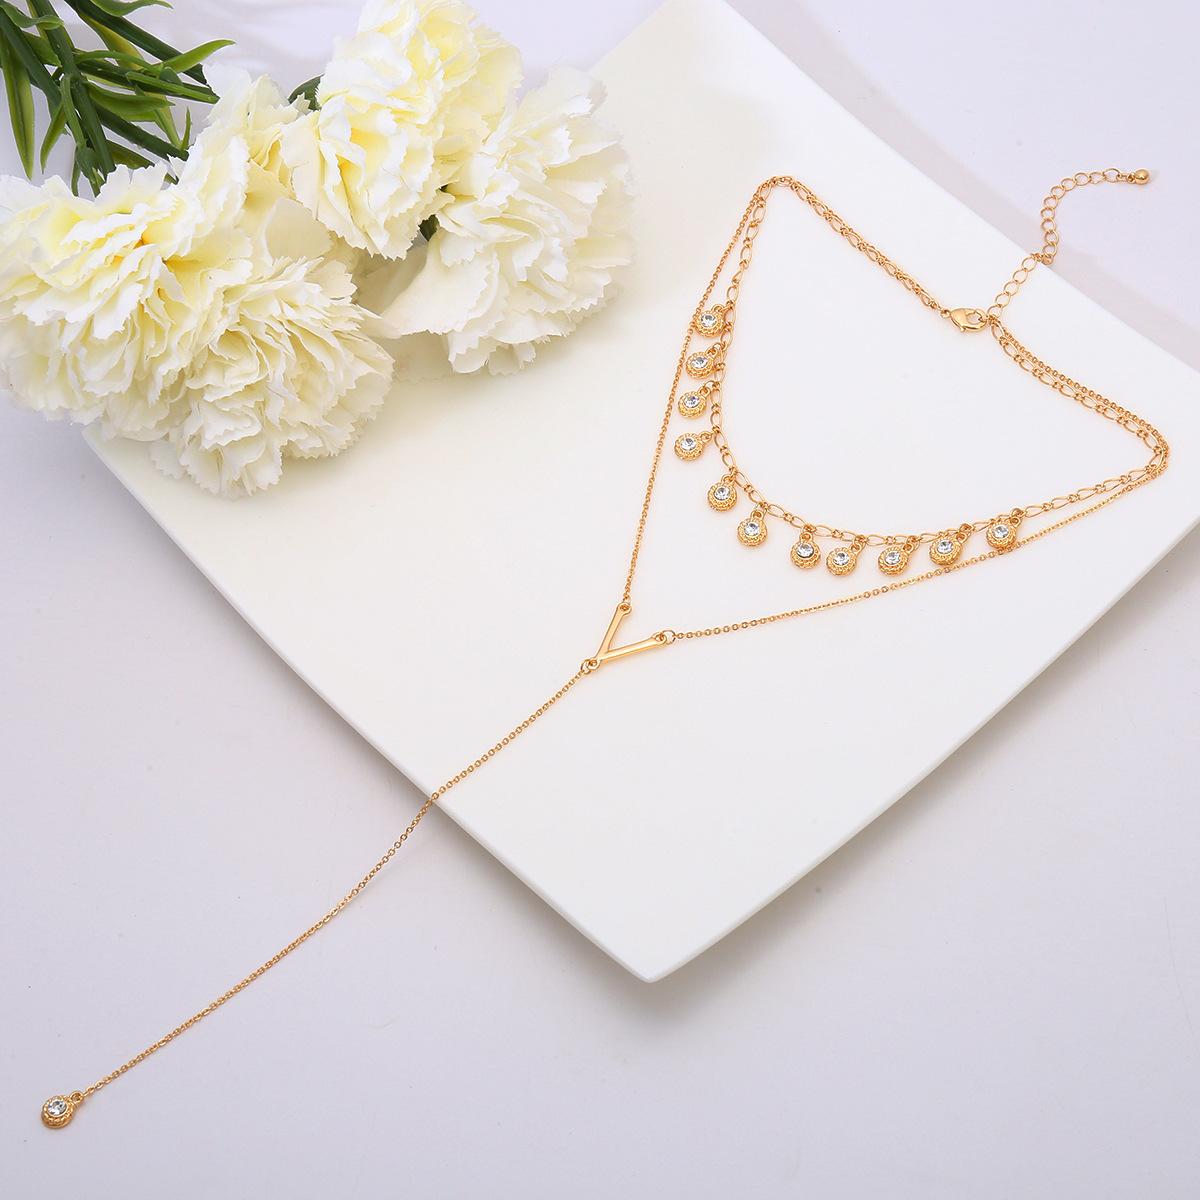 Alloy Simple Tassel necklace  Alloy 1967 NHXR2473Alloy1967